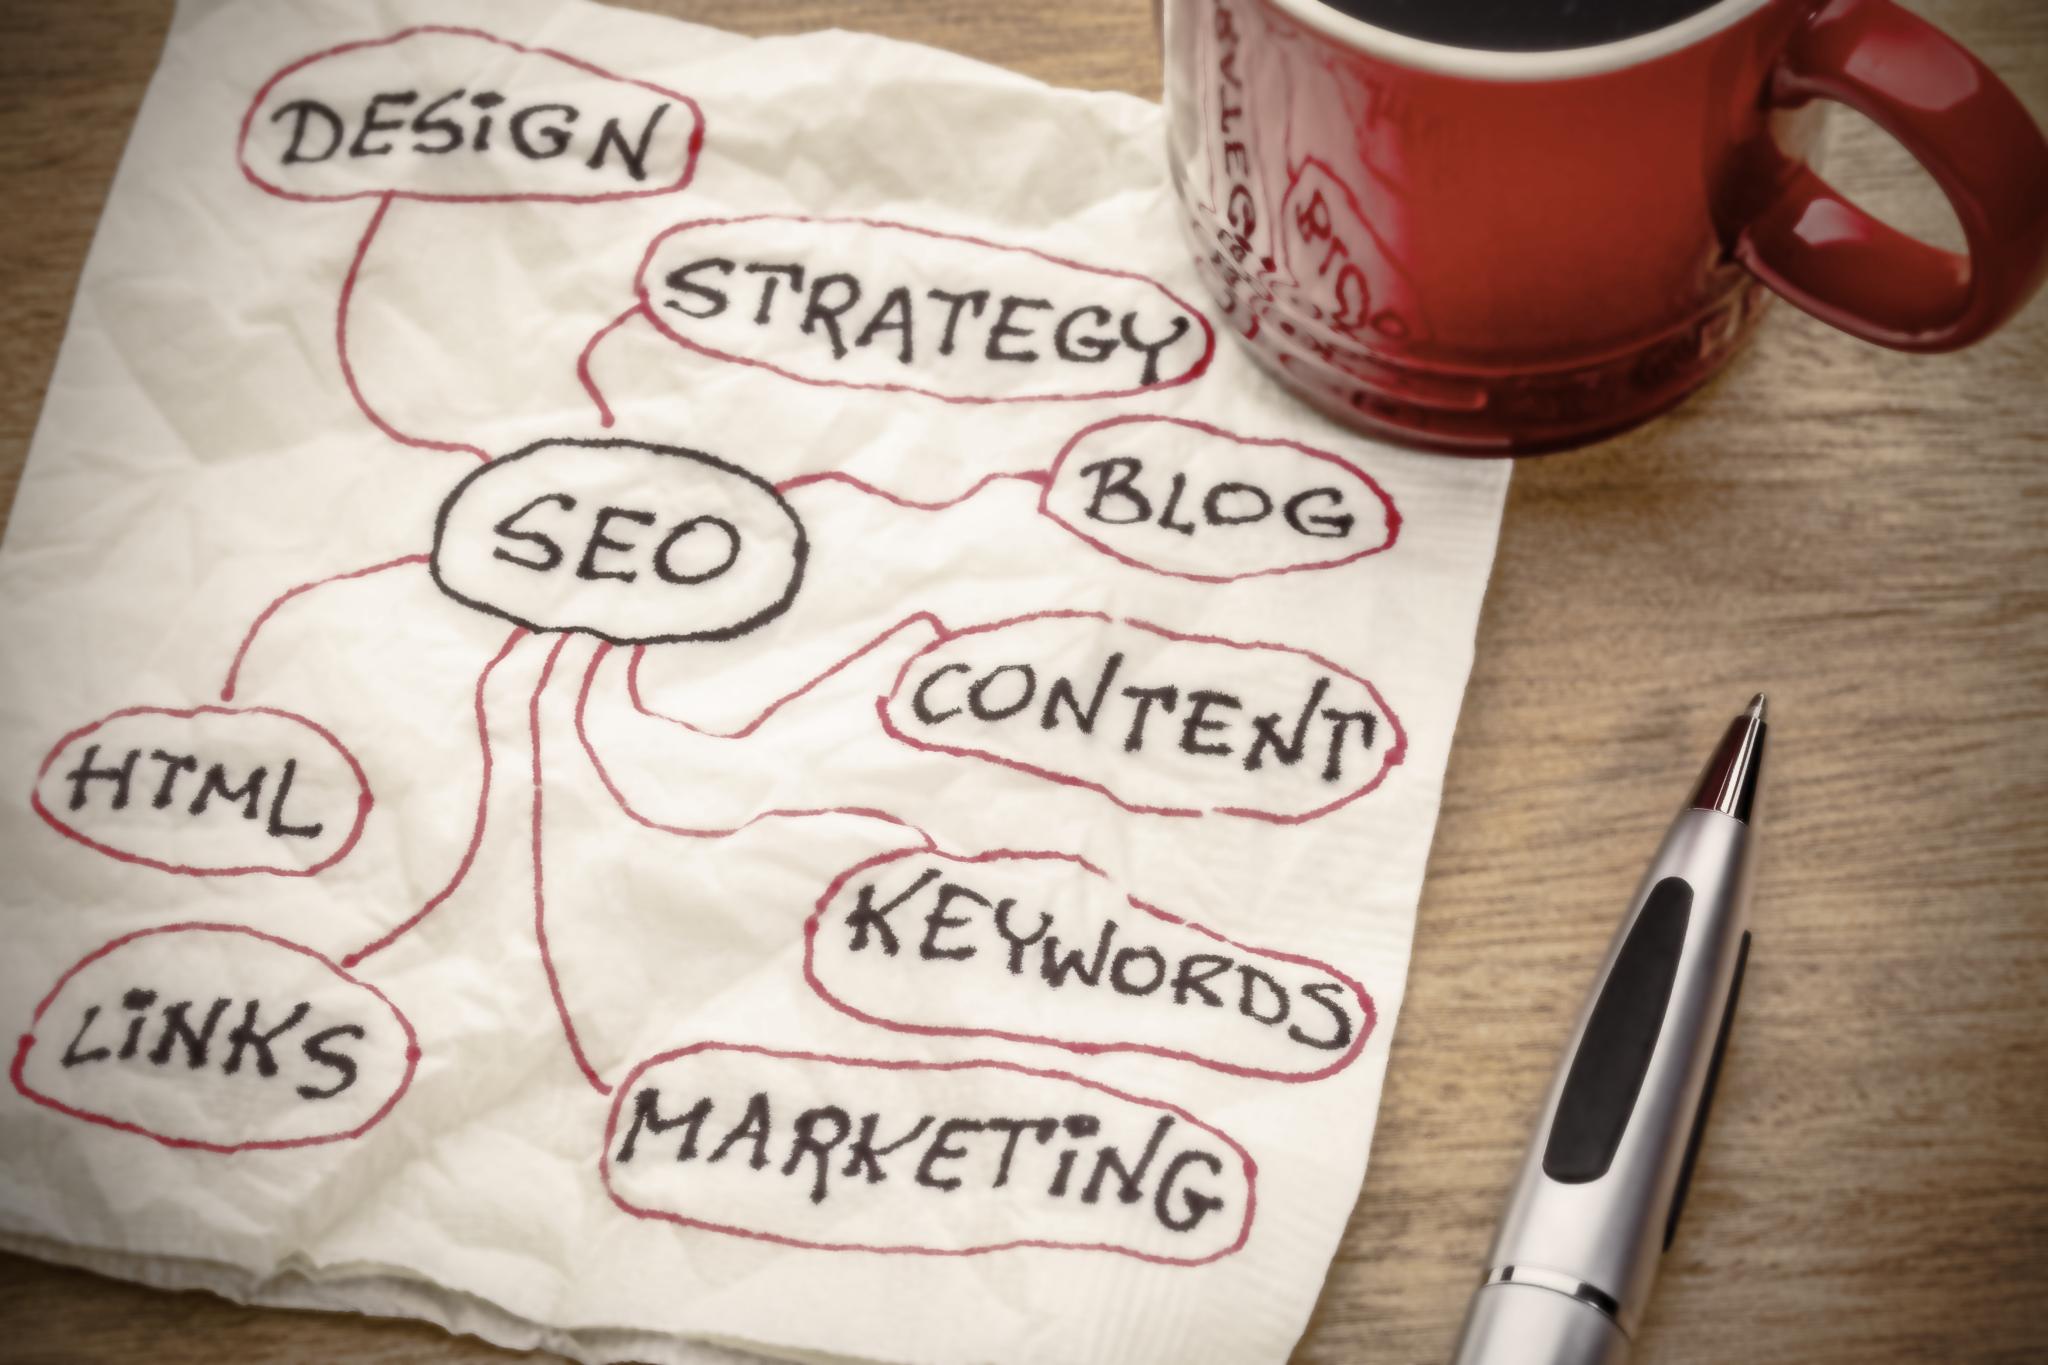 Digitale Vertriebs- und Marketingstrategien